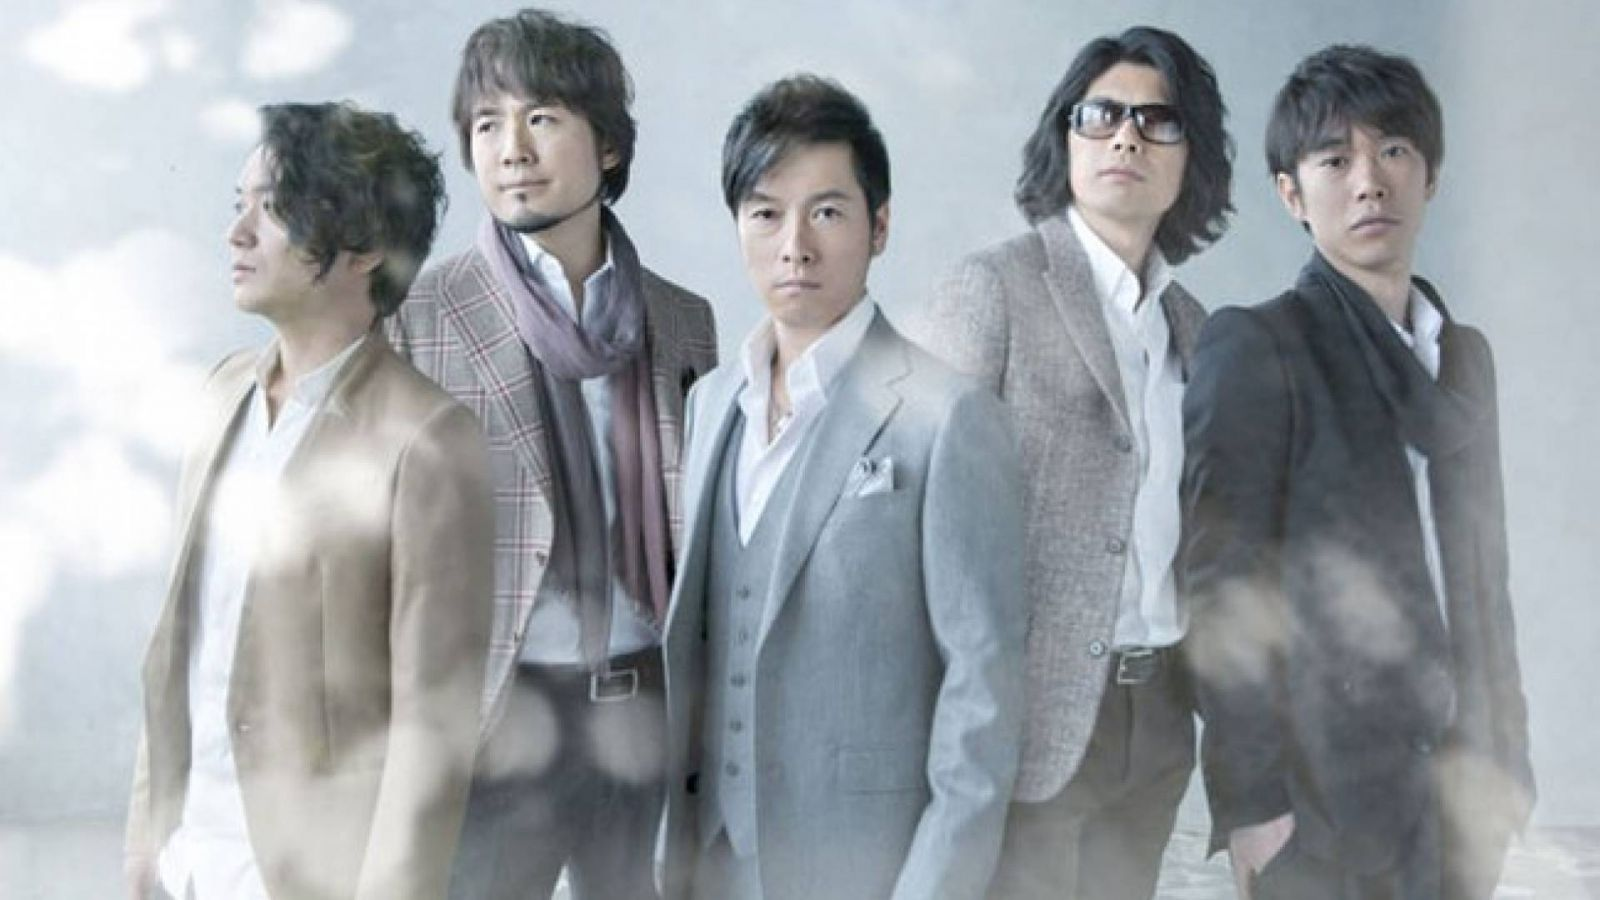 The Gospellers © Sony Music Entertainment (Japan) Inc.